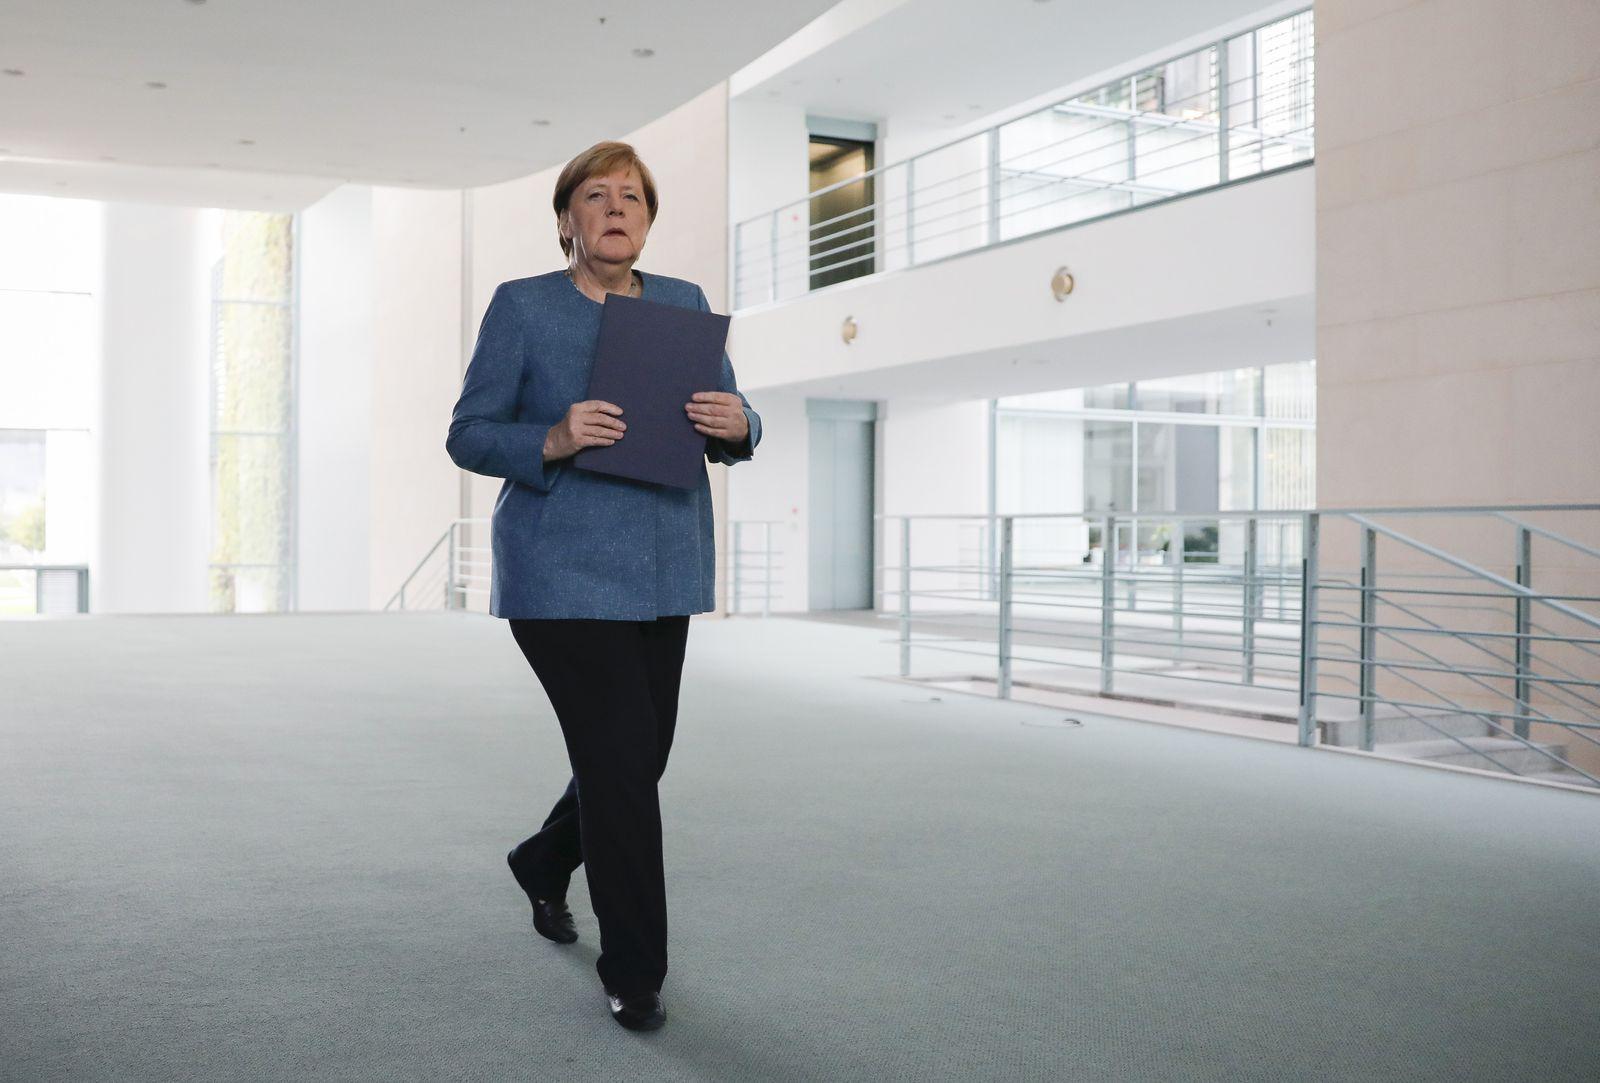 Bundeskanzlerin Merkel - Kreml-Kritiker Nawalny